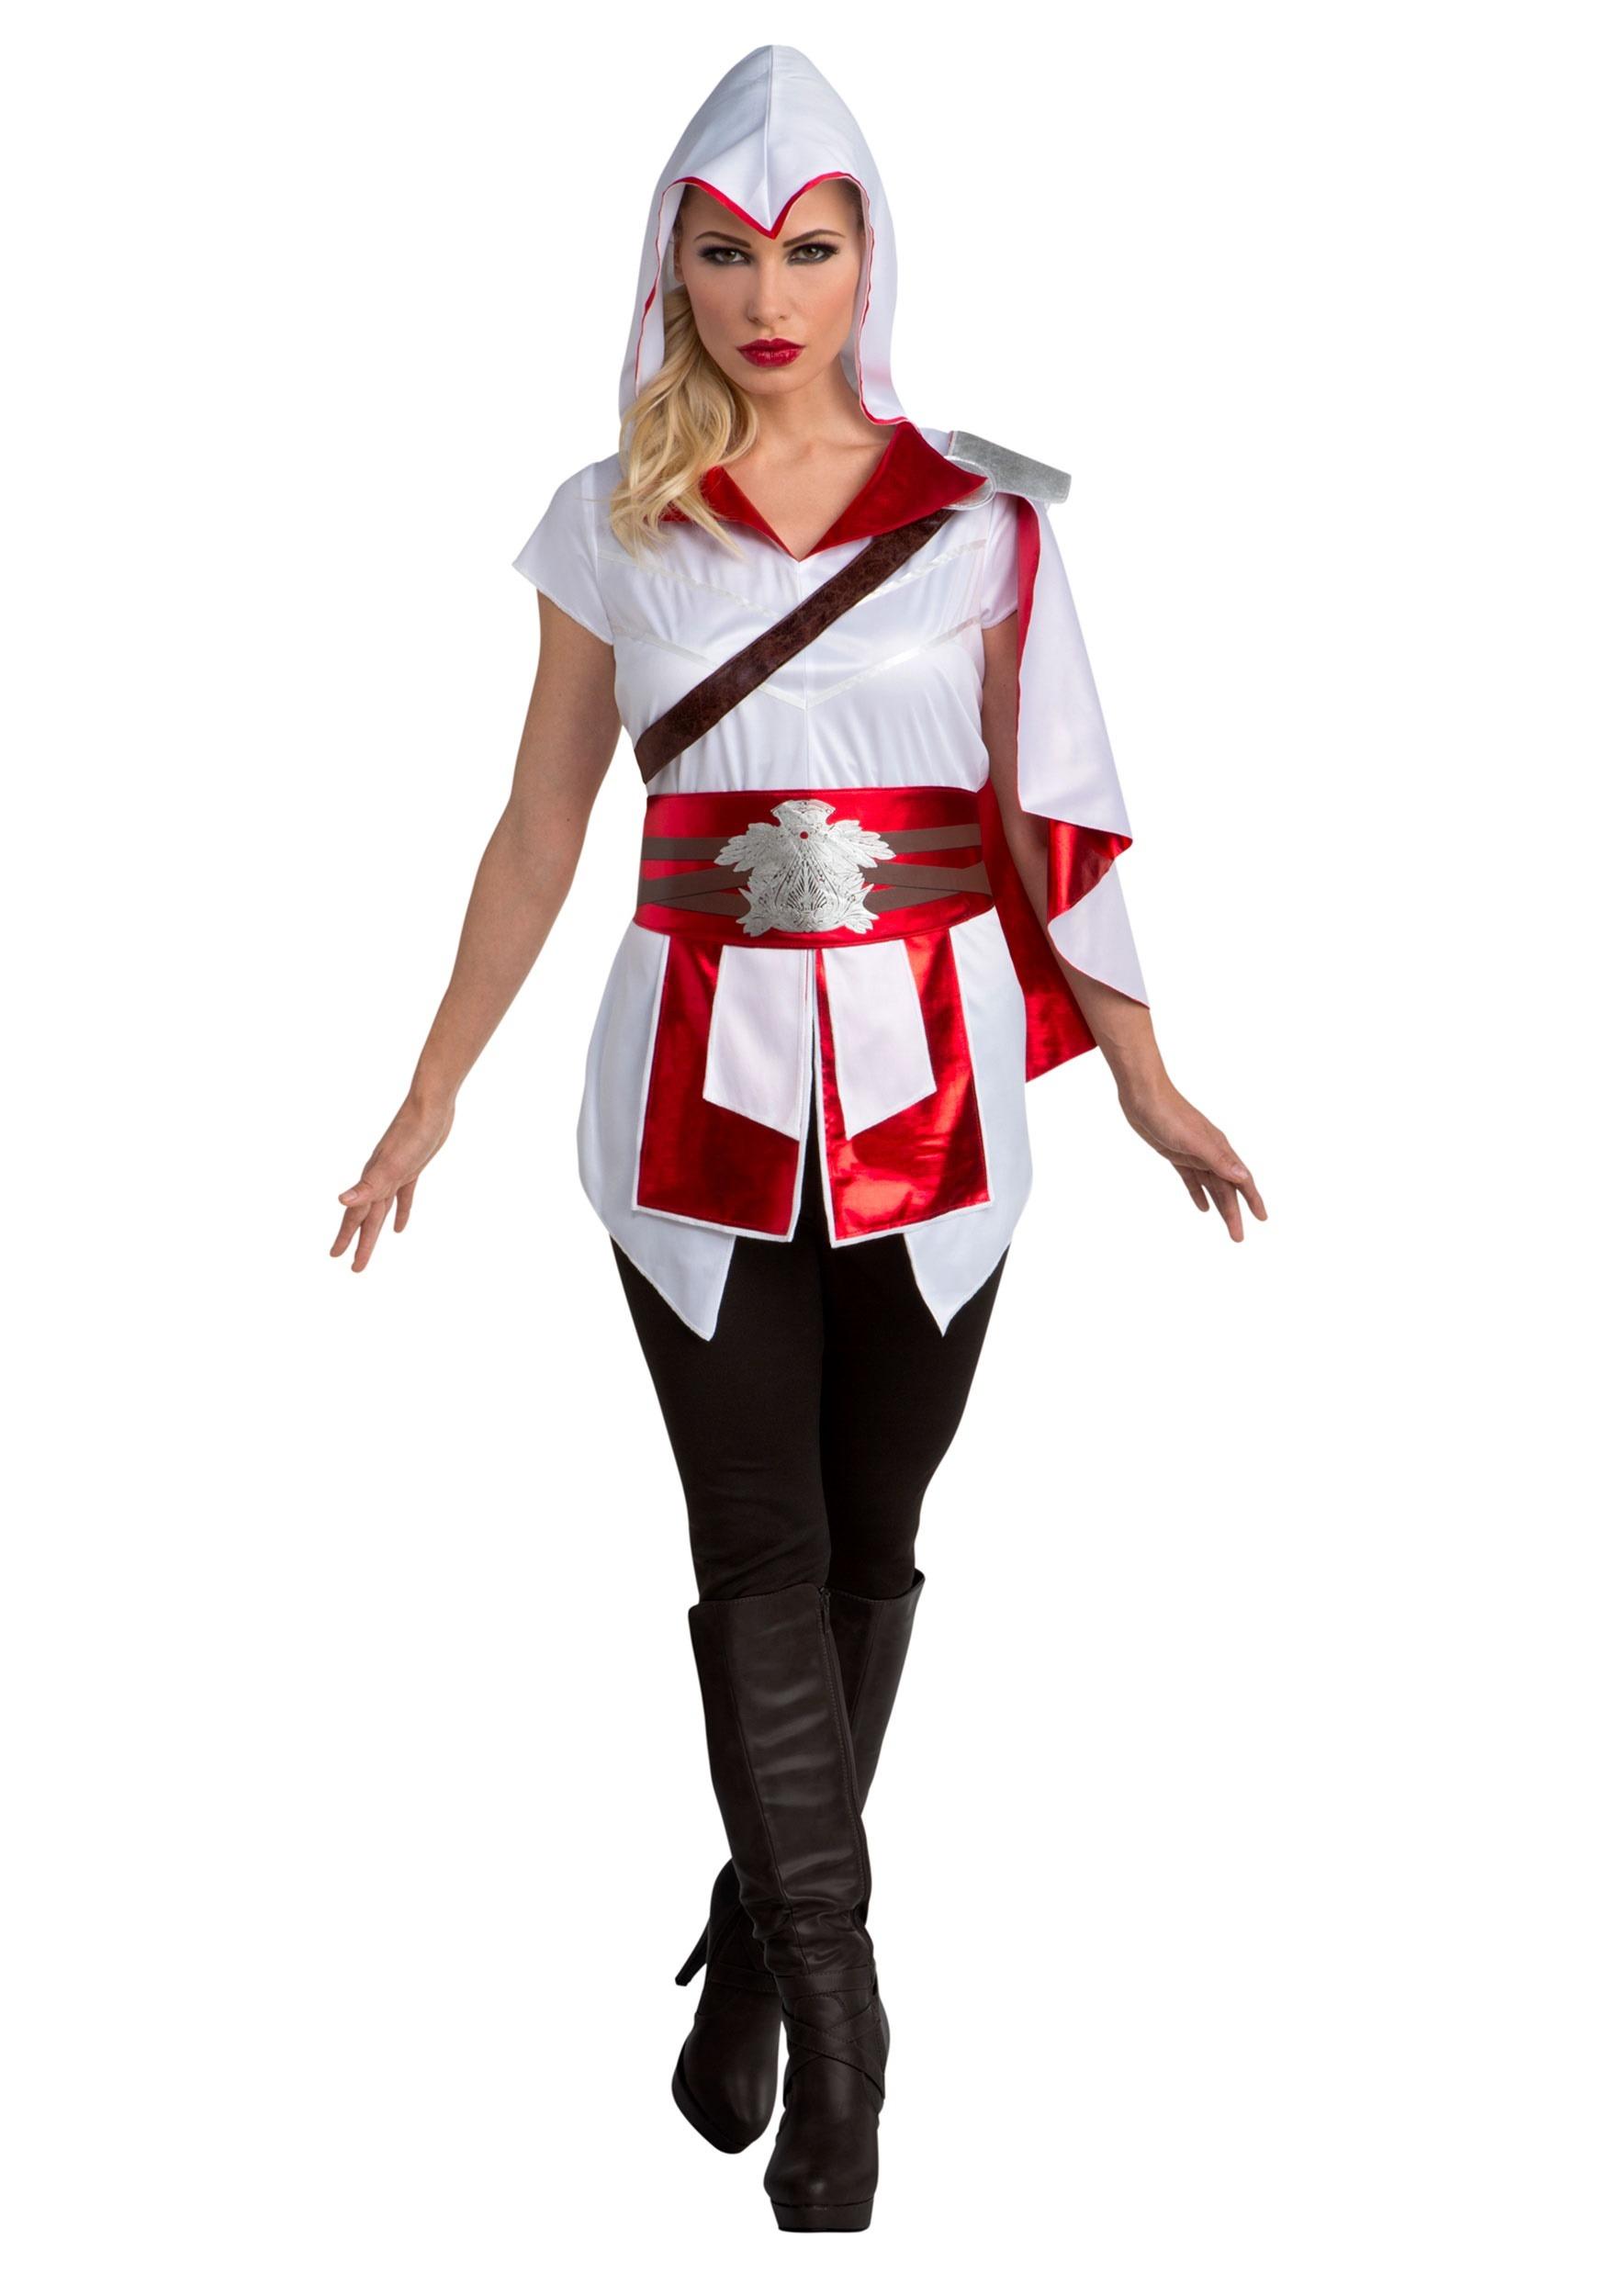 Assassin S Creed Ii Ezio Costume For Women